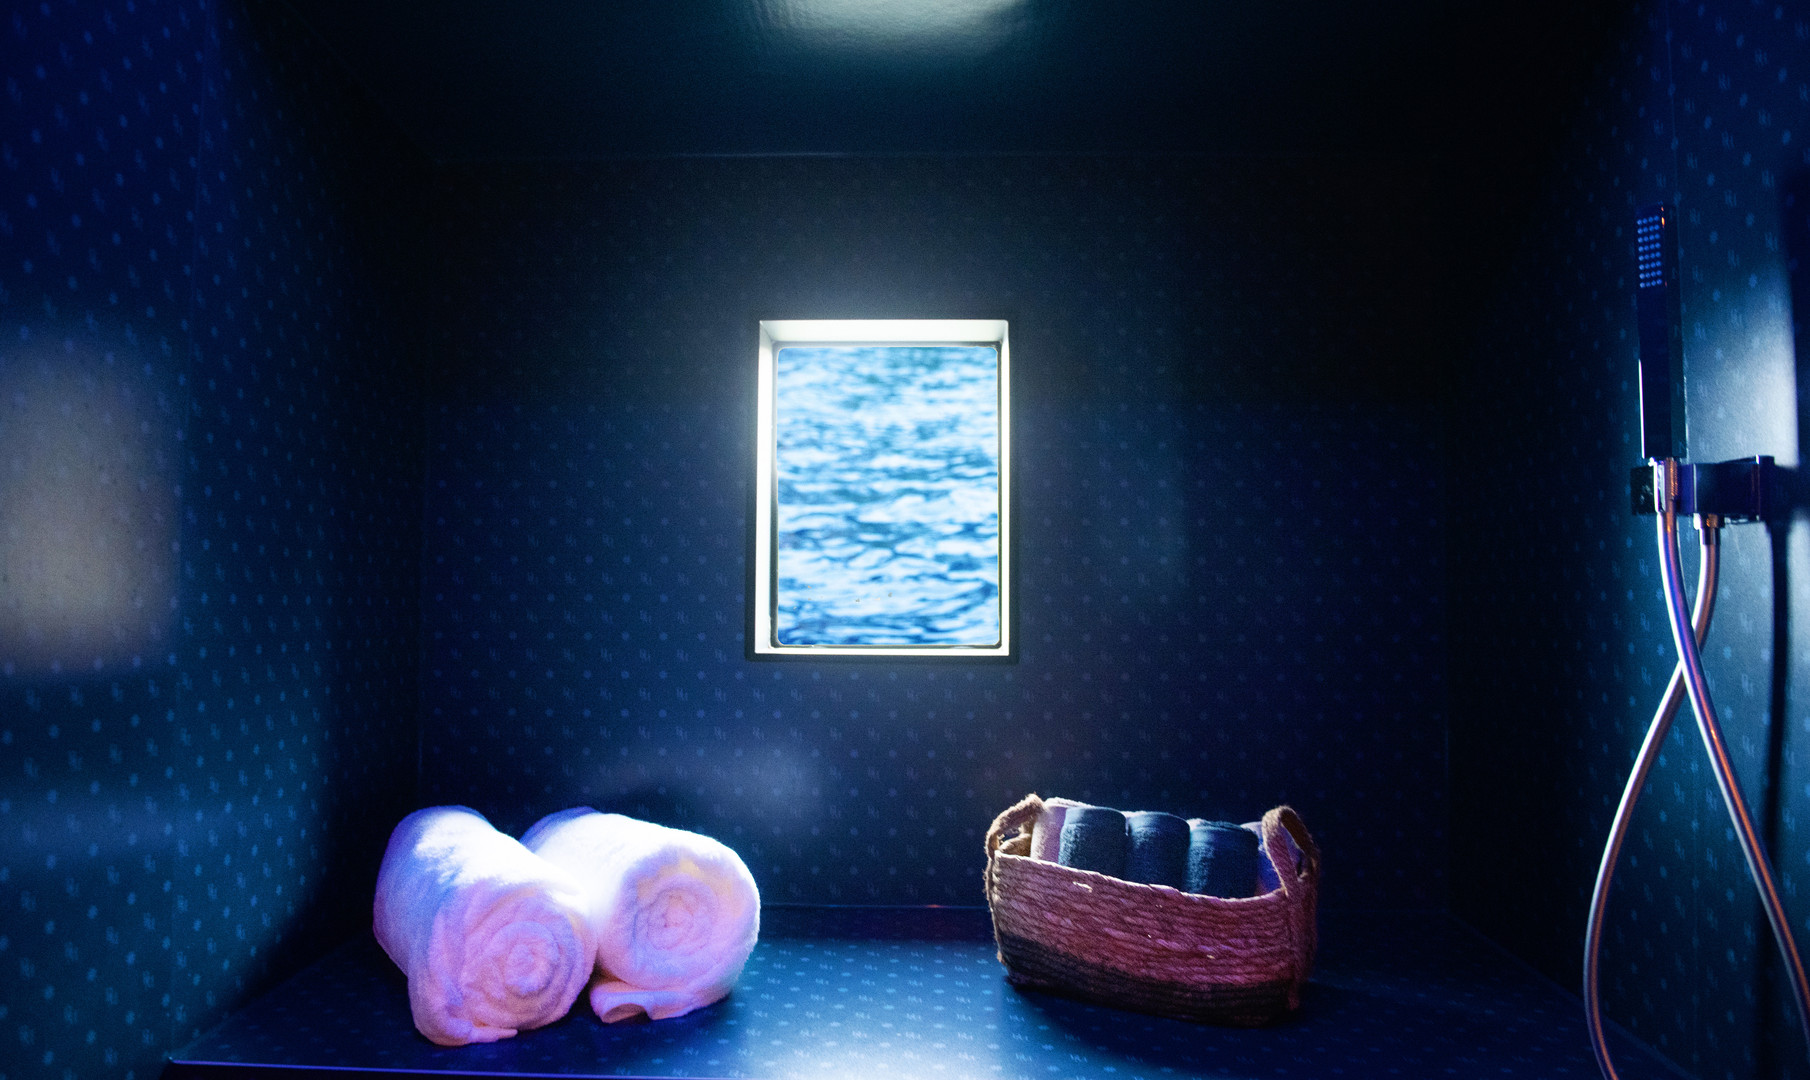 Cruising Home Hausboot - Blue Motion